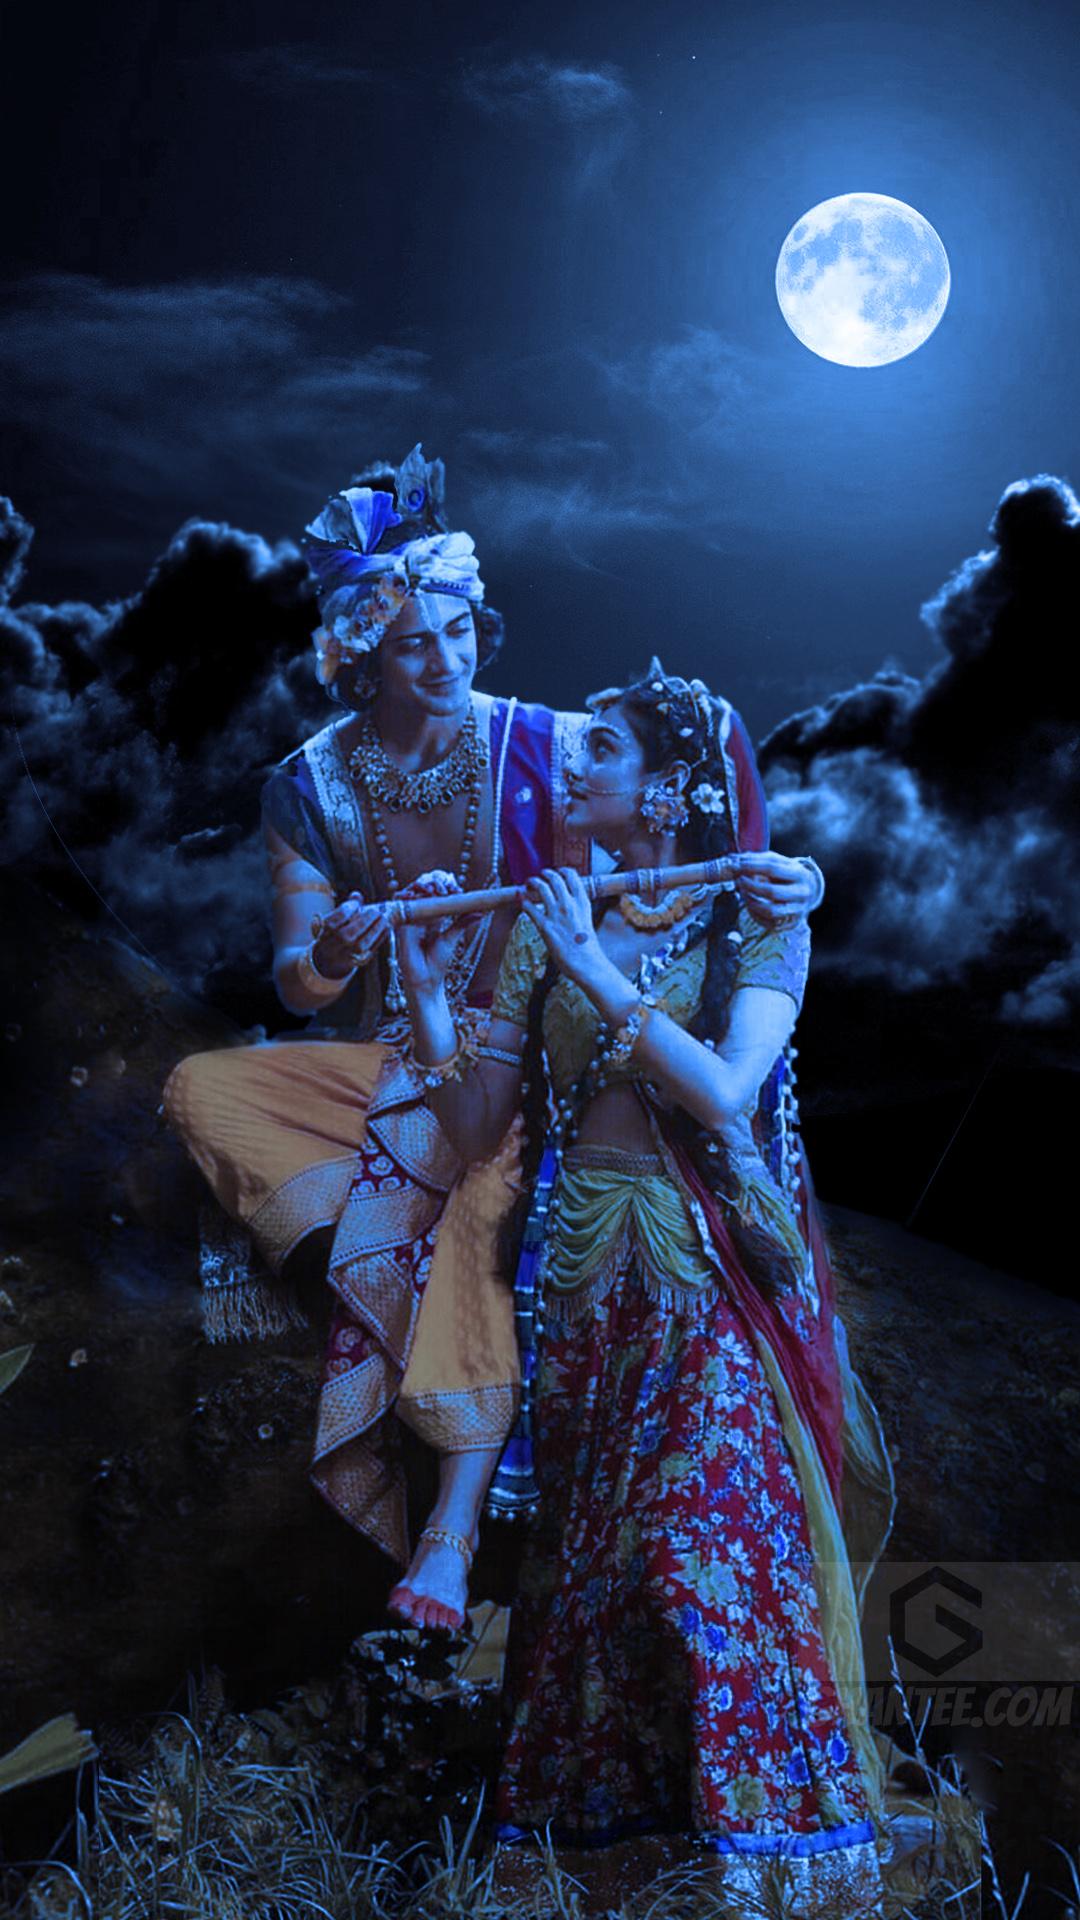 radhakrishna serial hd image beautiful night